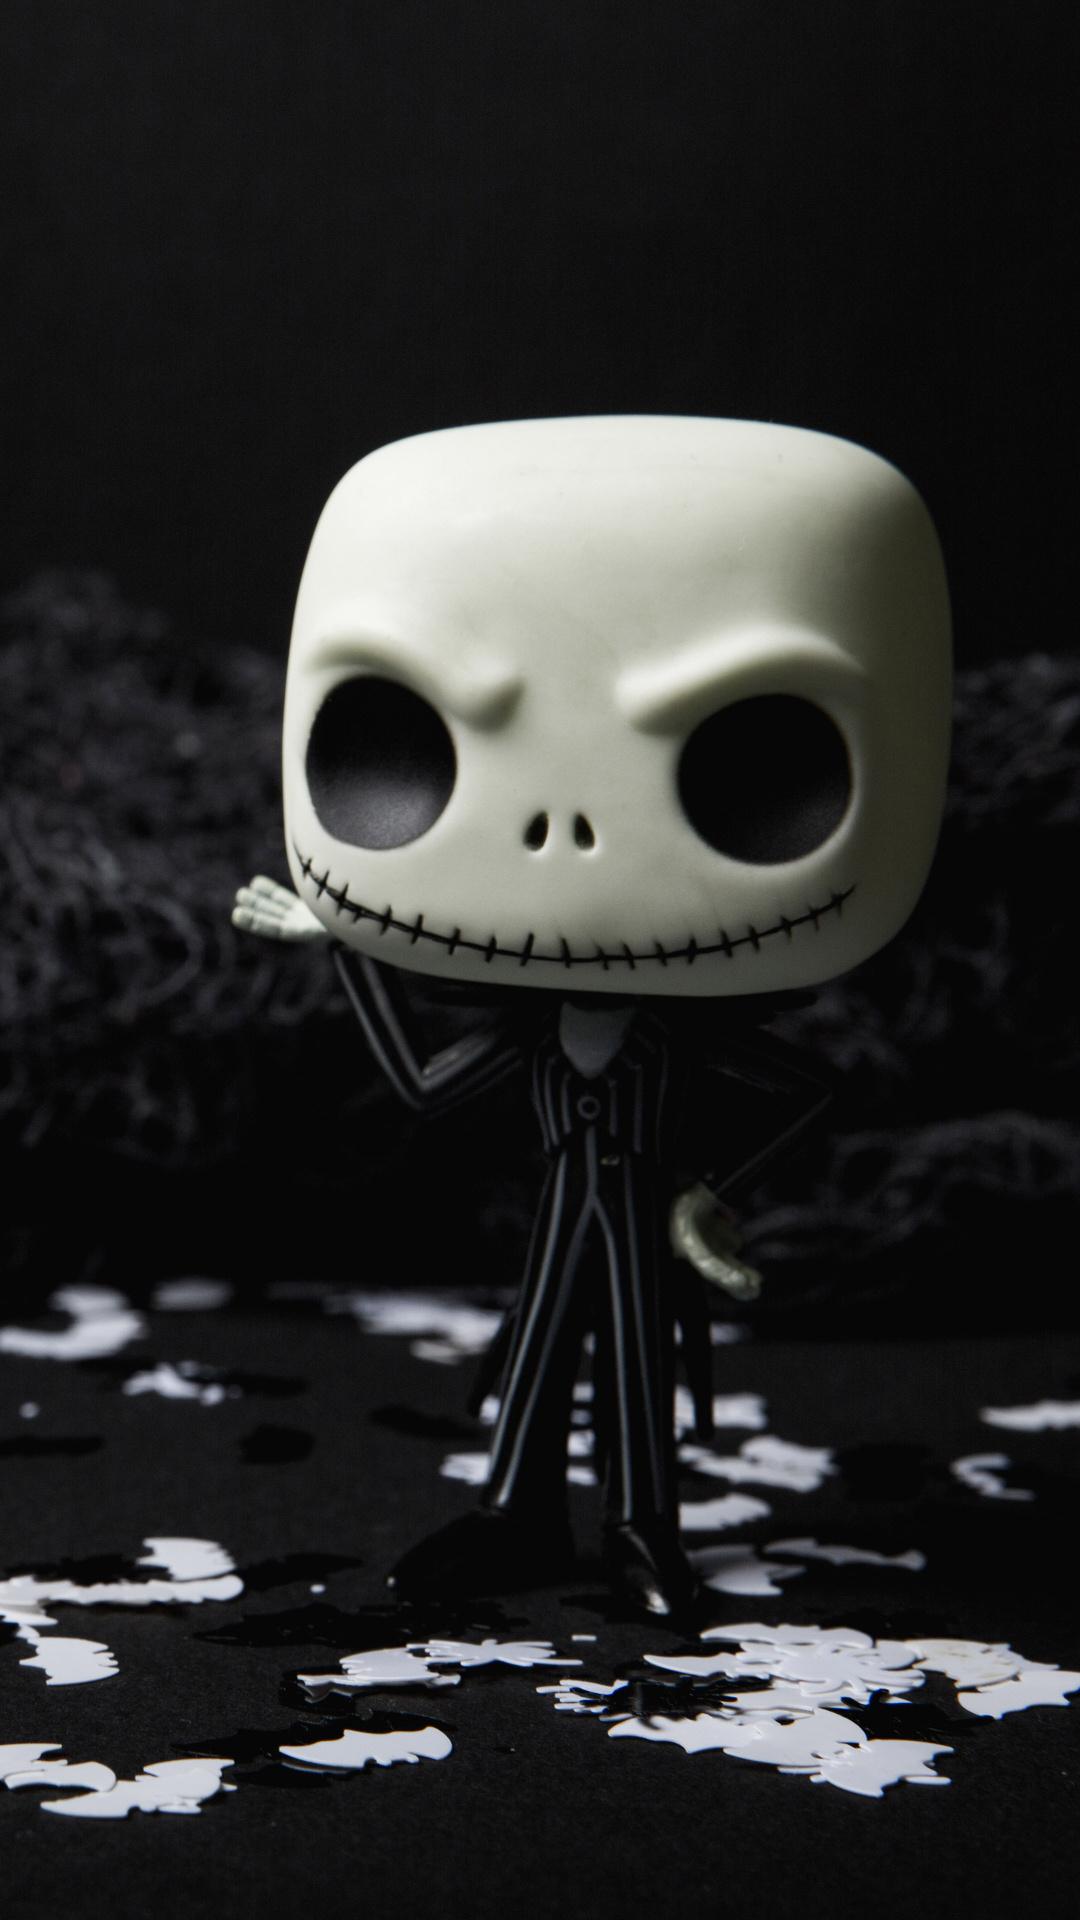 1080x1920 scary skull doll halloween creepy 5k iphone 7 6s - Scary skull backgrounds ...